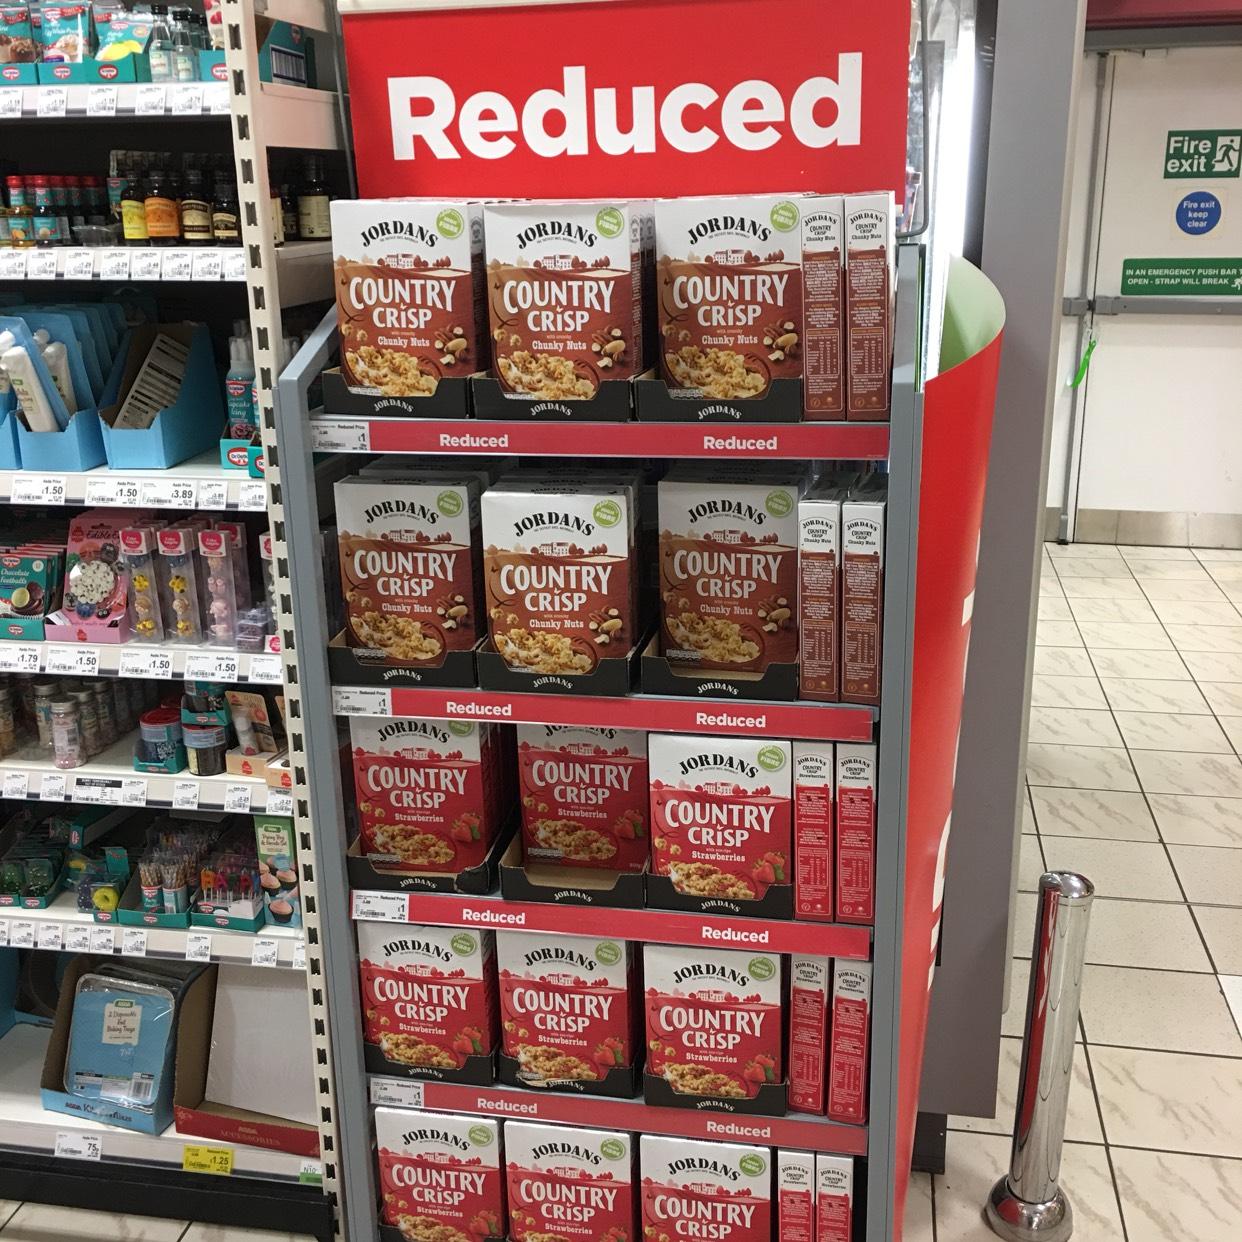 Jordan's County Crisp 500g strawberry/nut reduced to £1 @ Asda kilkeel